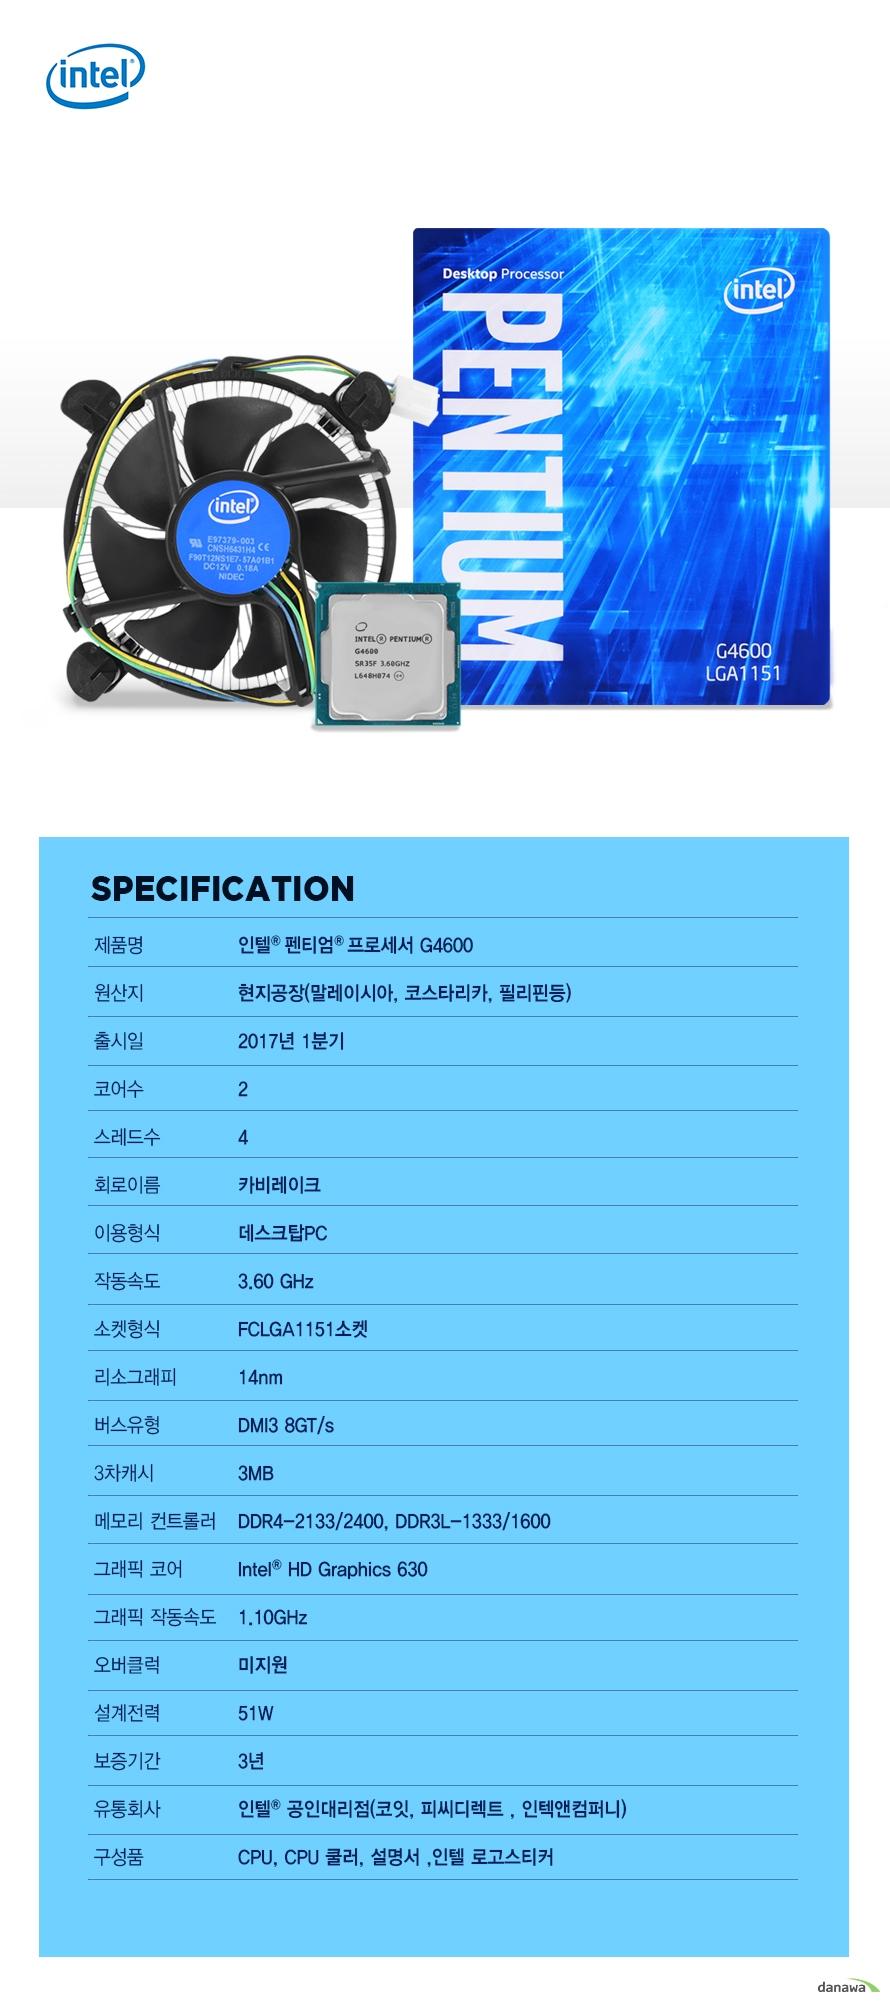 SPECIFICATION                제품명 인텔 펜티엄 프로세서 G4600                        원산지 현지공장 말레이시아 코스타리카 필리핀등                출시일 2017년 1분기                코어수 2                스레드수 4                 회로이름 카비레이크                이용형식 데스크탑PC                작동속도 3.60GHZ                소켓형식 FCLGA1151소켓                리소그래피 14NM                버스유형 DMI3 8GT/S                3차캐시 3MB                메모리 컨트롤러 DDR4-2133/2400 DDR3L-1333/1600                그래픽 코어 INTEL HD GRAPHICS 630                그래픽 작동속도 1.10GHZ                오버클럭 미지원                설계전력 51W                보증기간 3년                유통회사 인텔 공인대리점 코잇 피씨디렉트 인텍엔 컴퍼니                구성품 CPU CPU쿨러 설명서 인텔 로고스티커